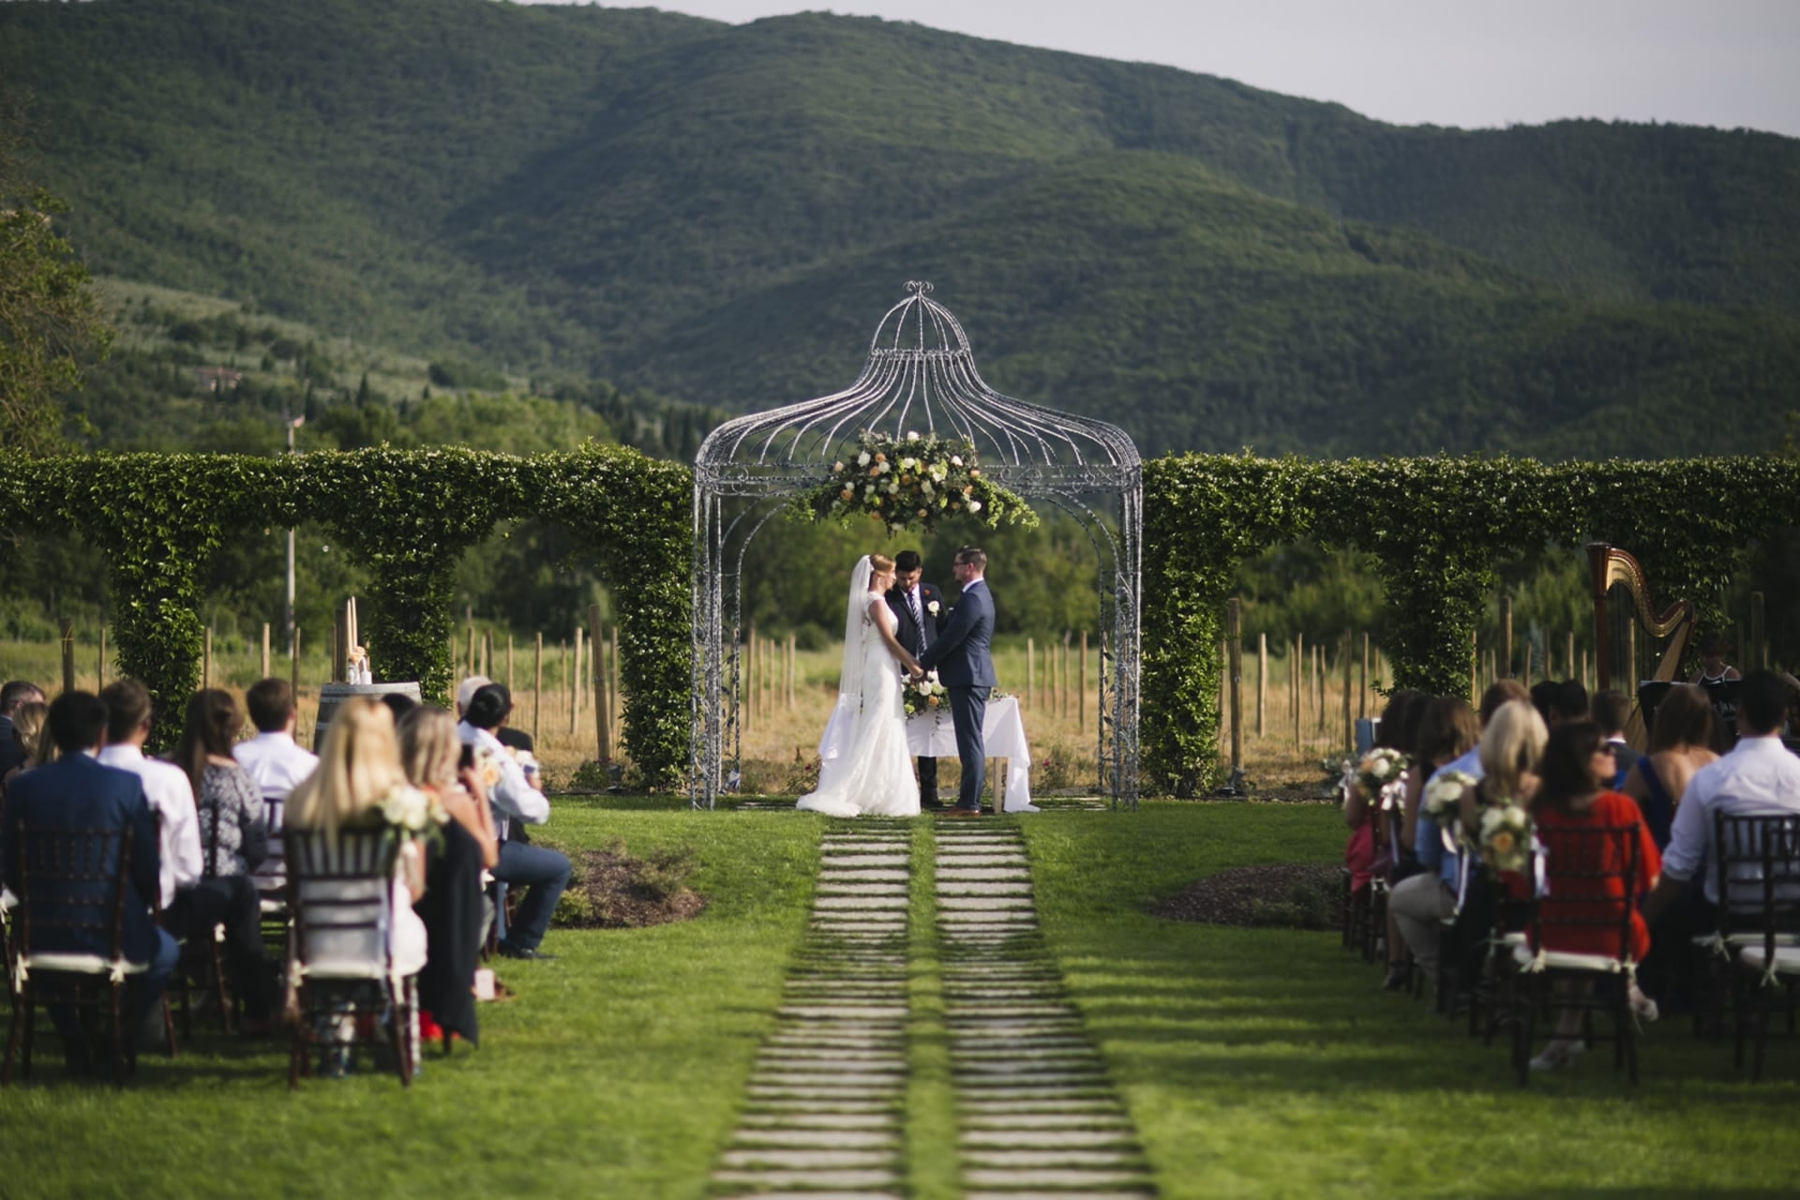 Matrimonio Cantina Toscana : Matrimonio a cortona in toscana famiglia buccelletti